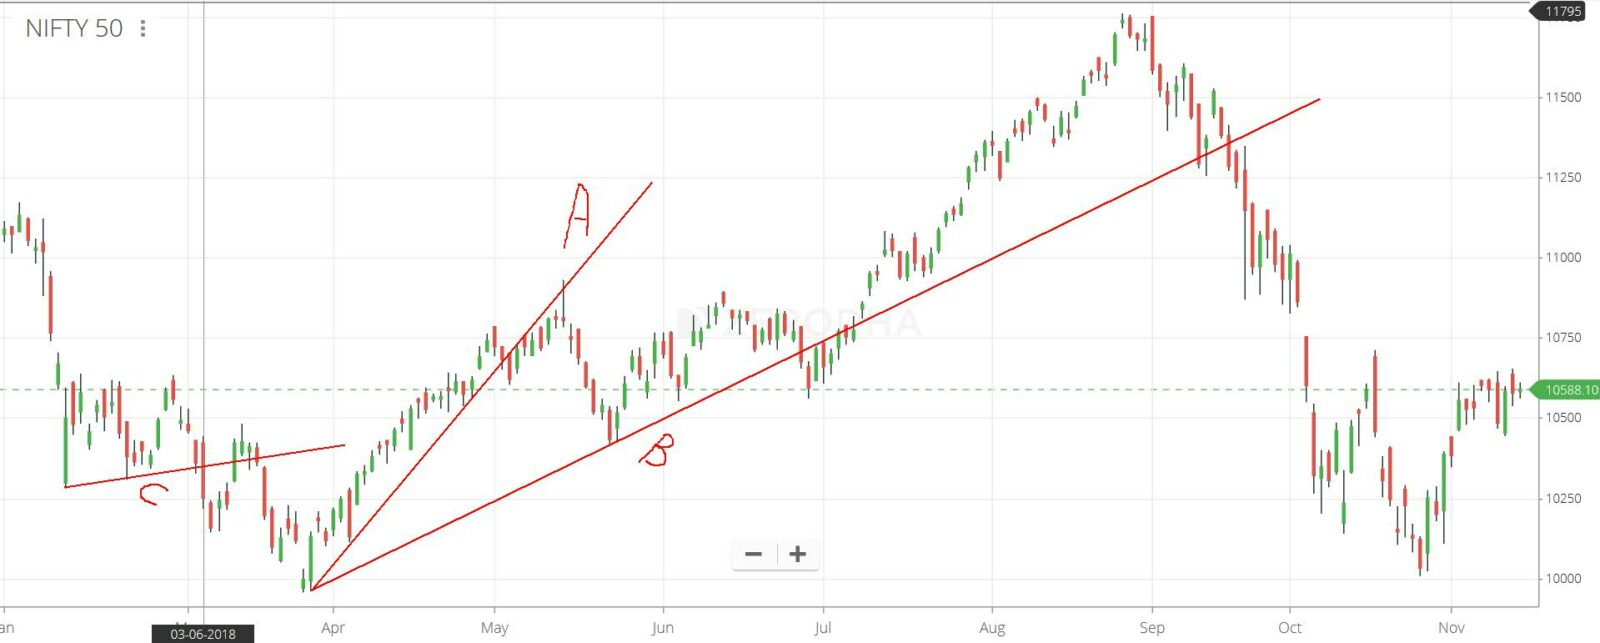 Trend Line Slopes